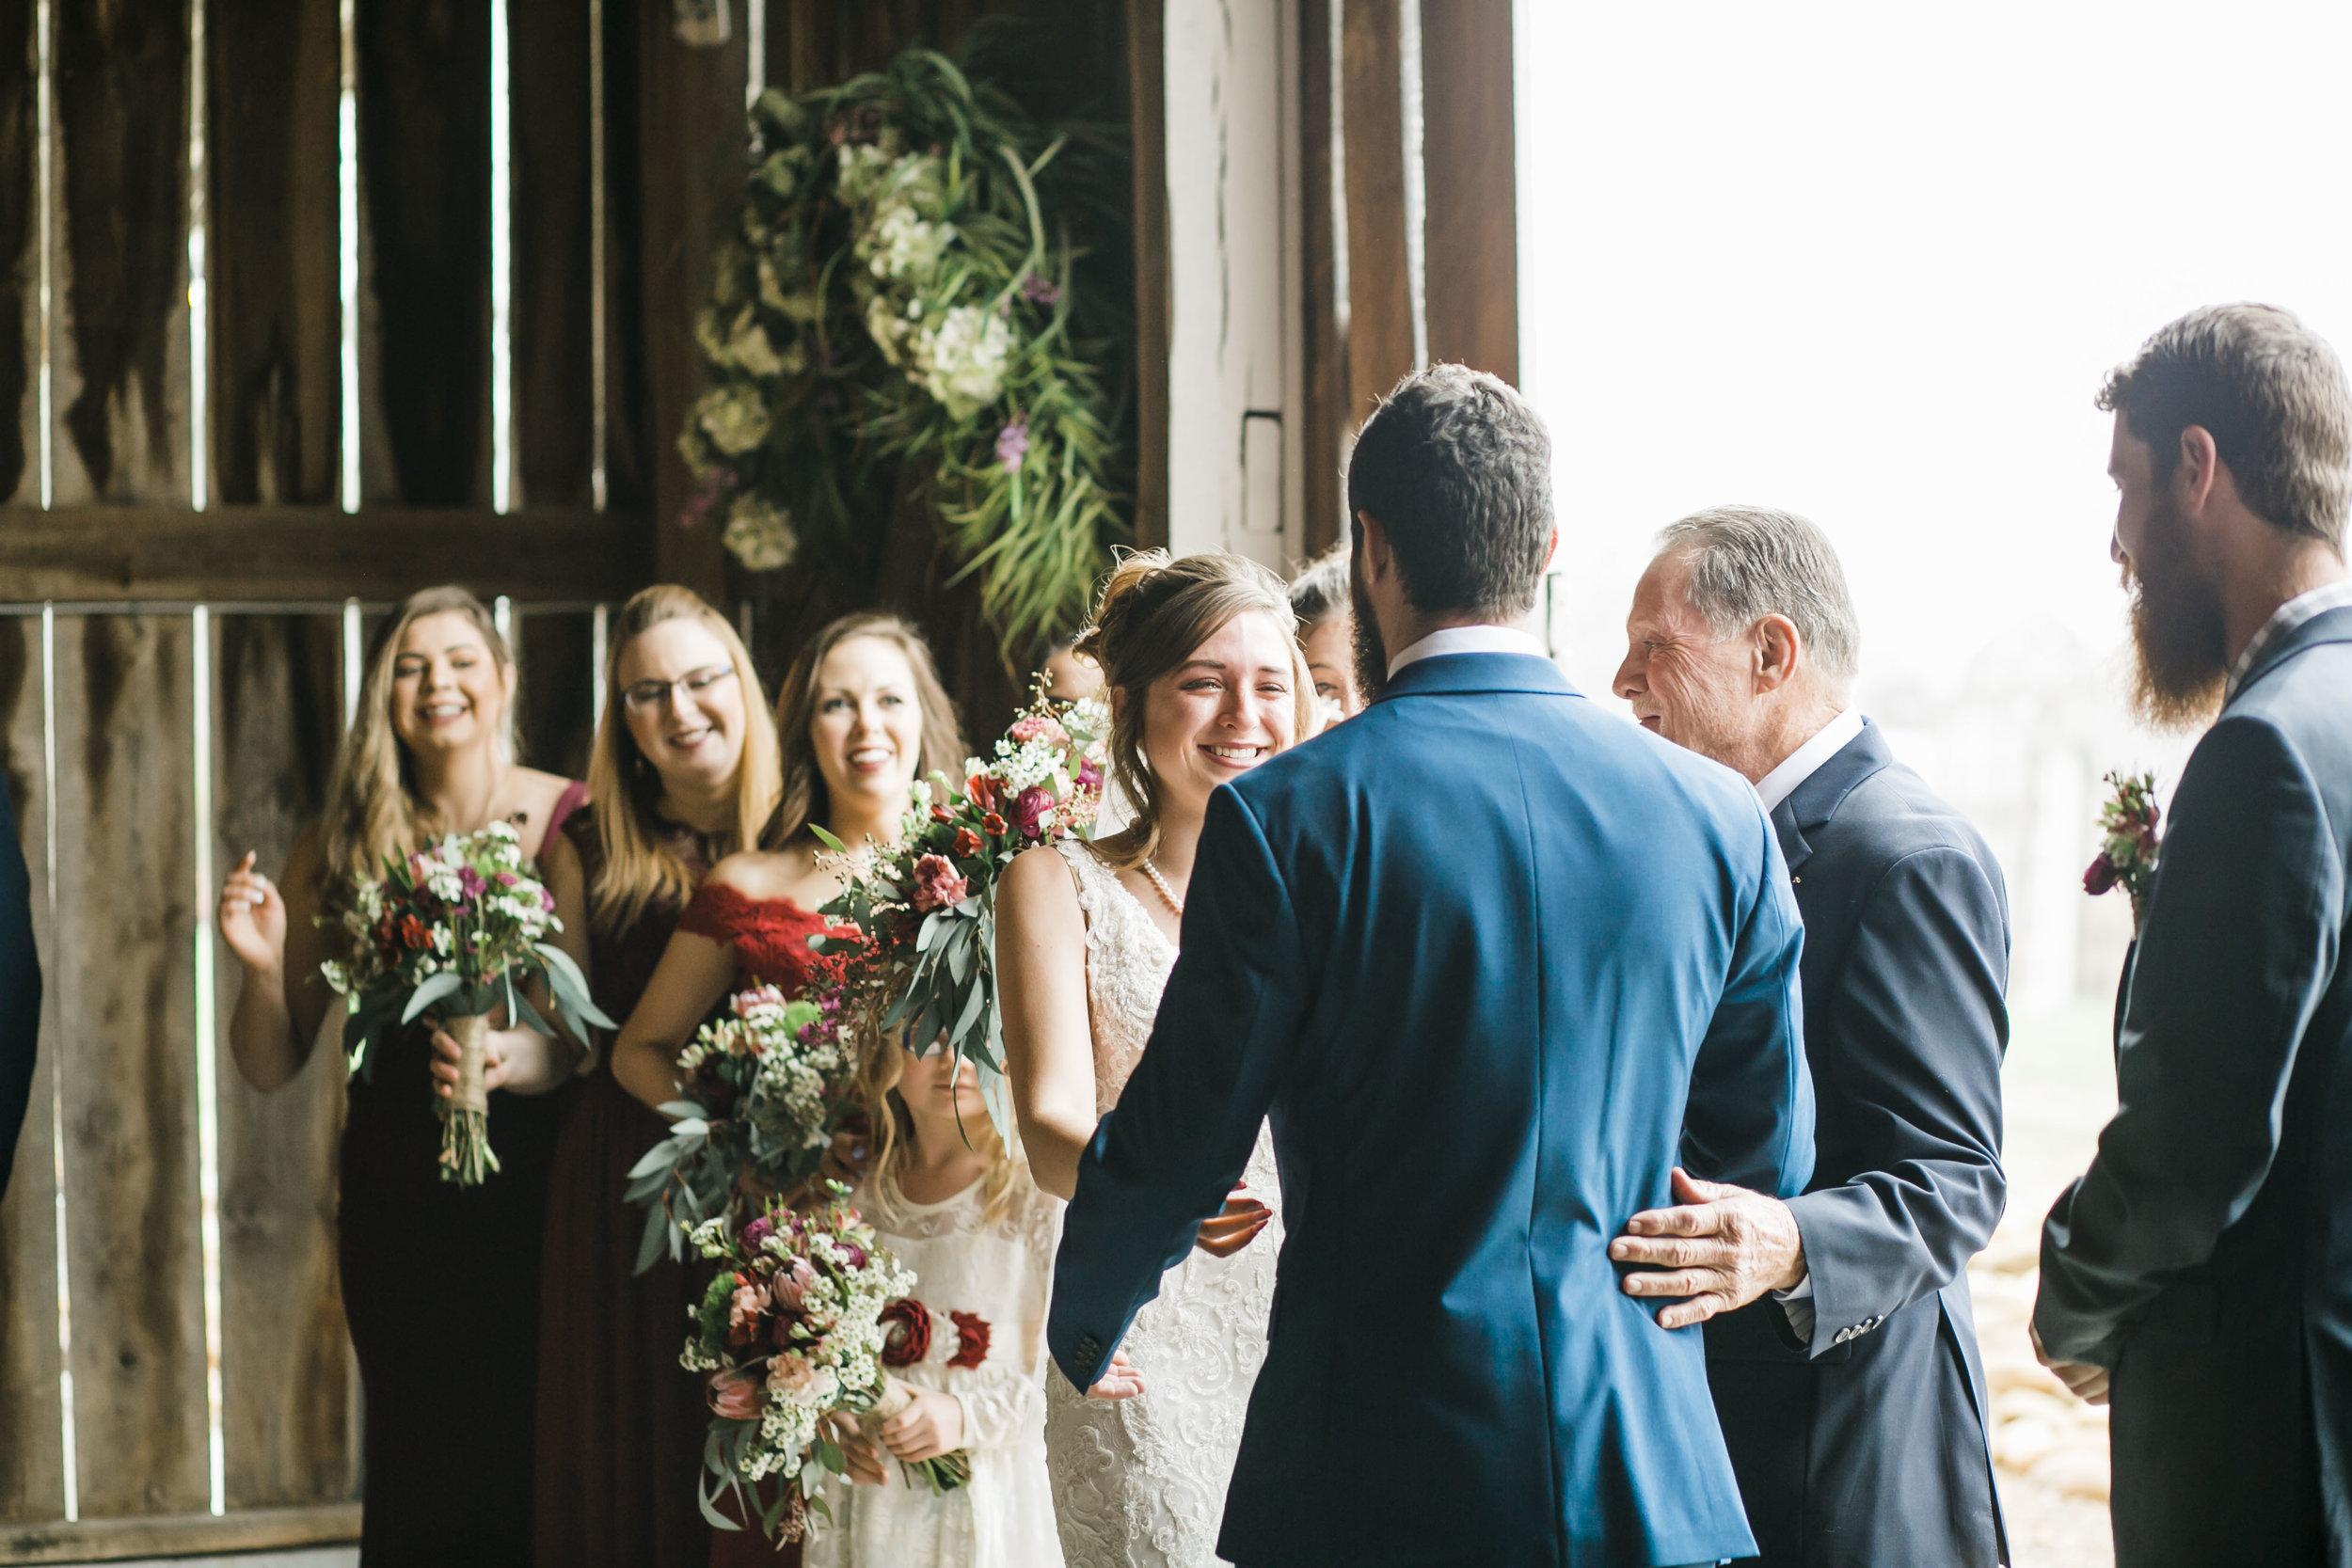 Heartland Meadows Knoxville Barn Wedding Rainy